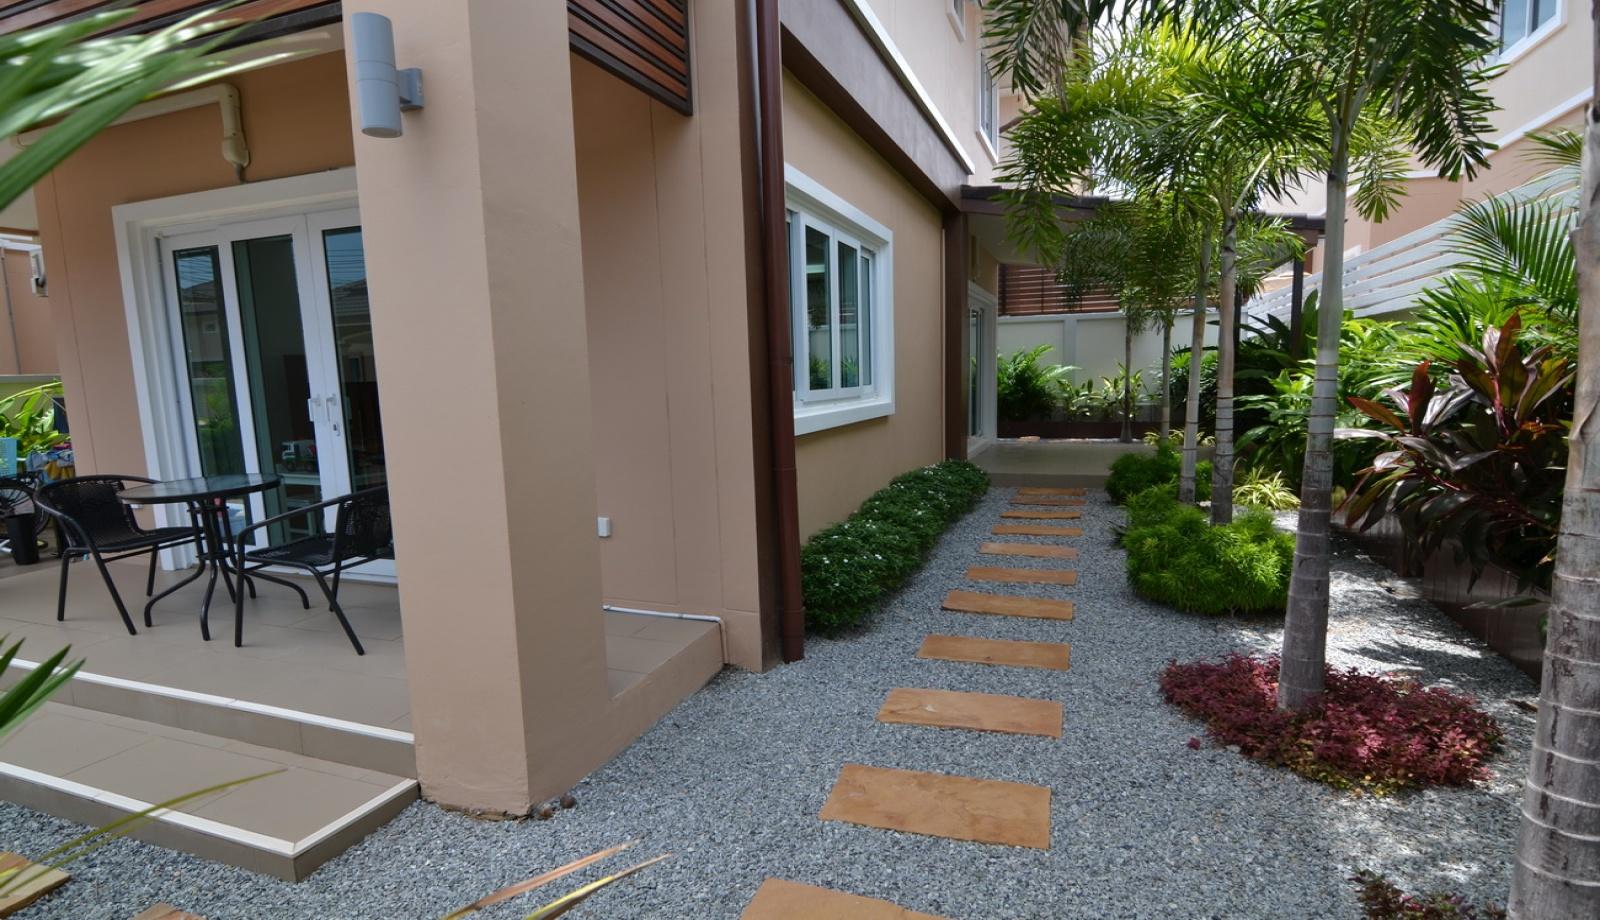 East Pattaya, 3 Bedrooms Bedrooms, ,3 BathroomsBathrooms,House,House For Sale,1181